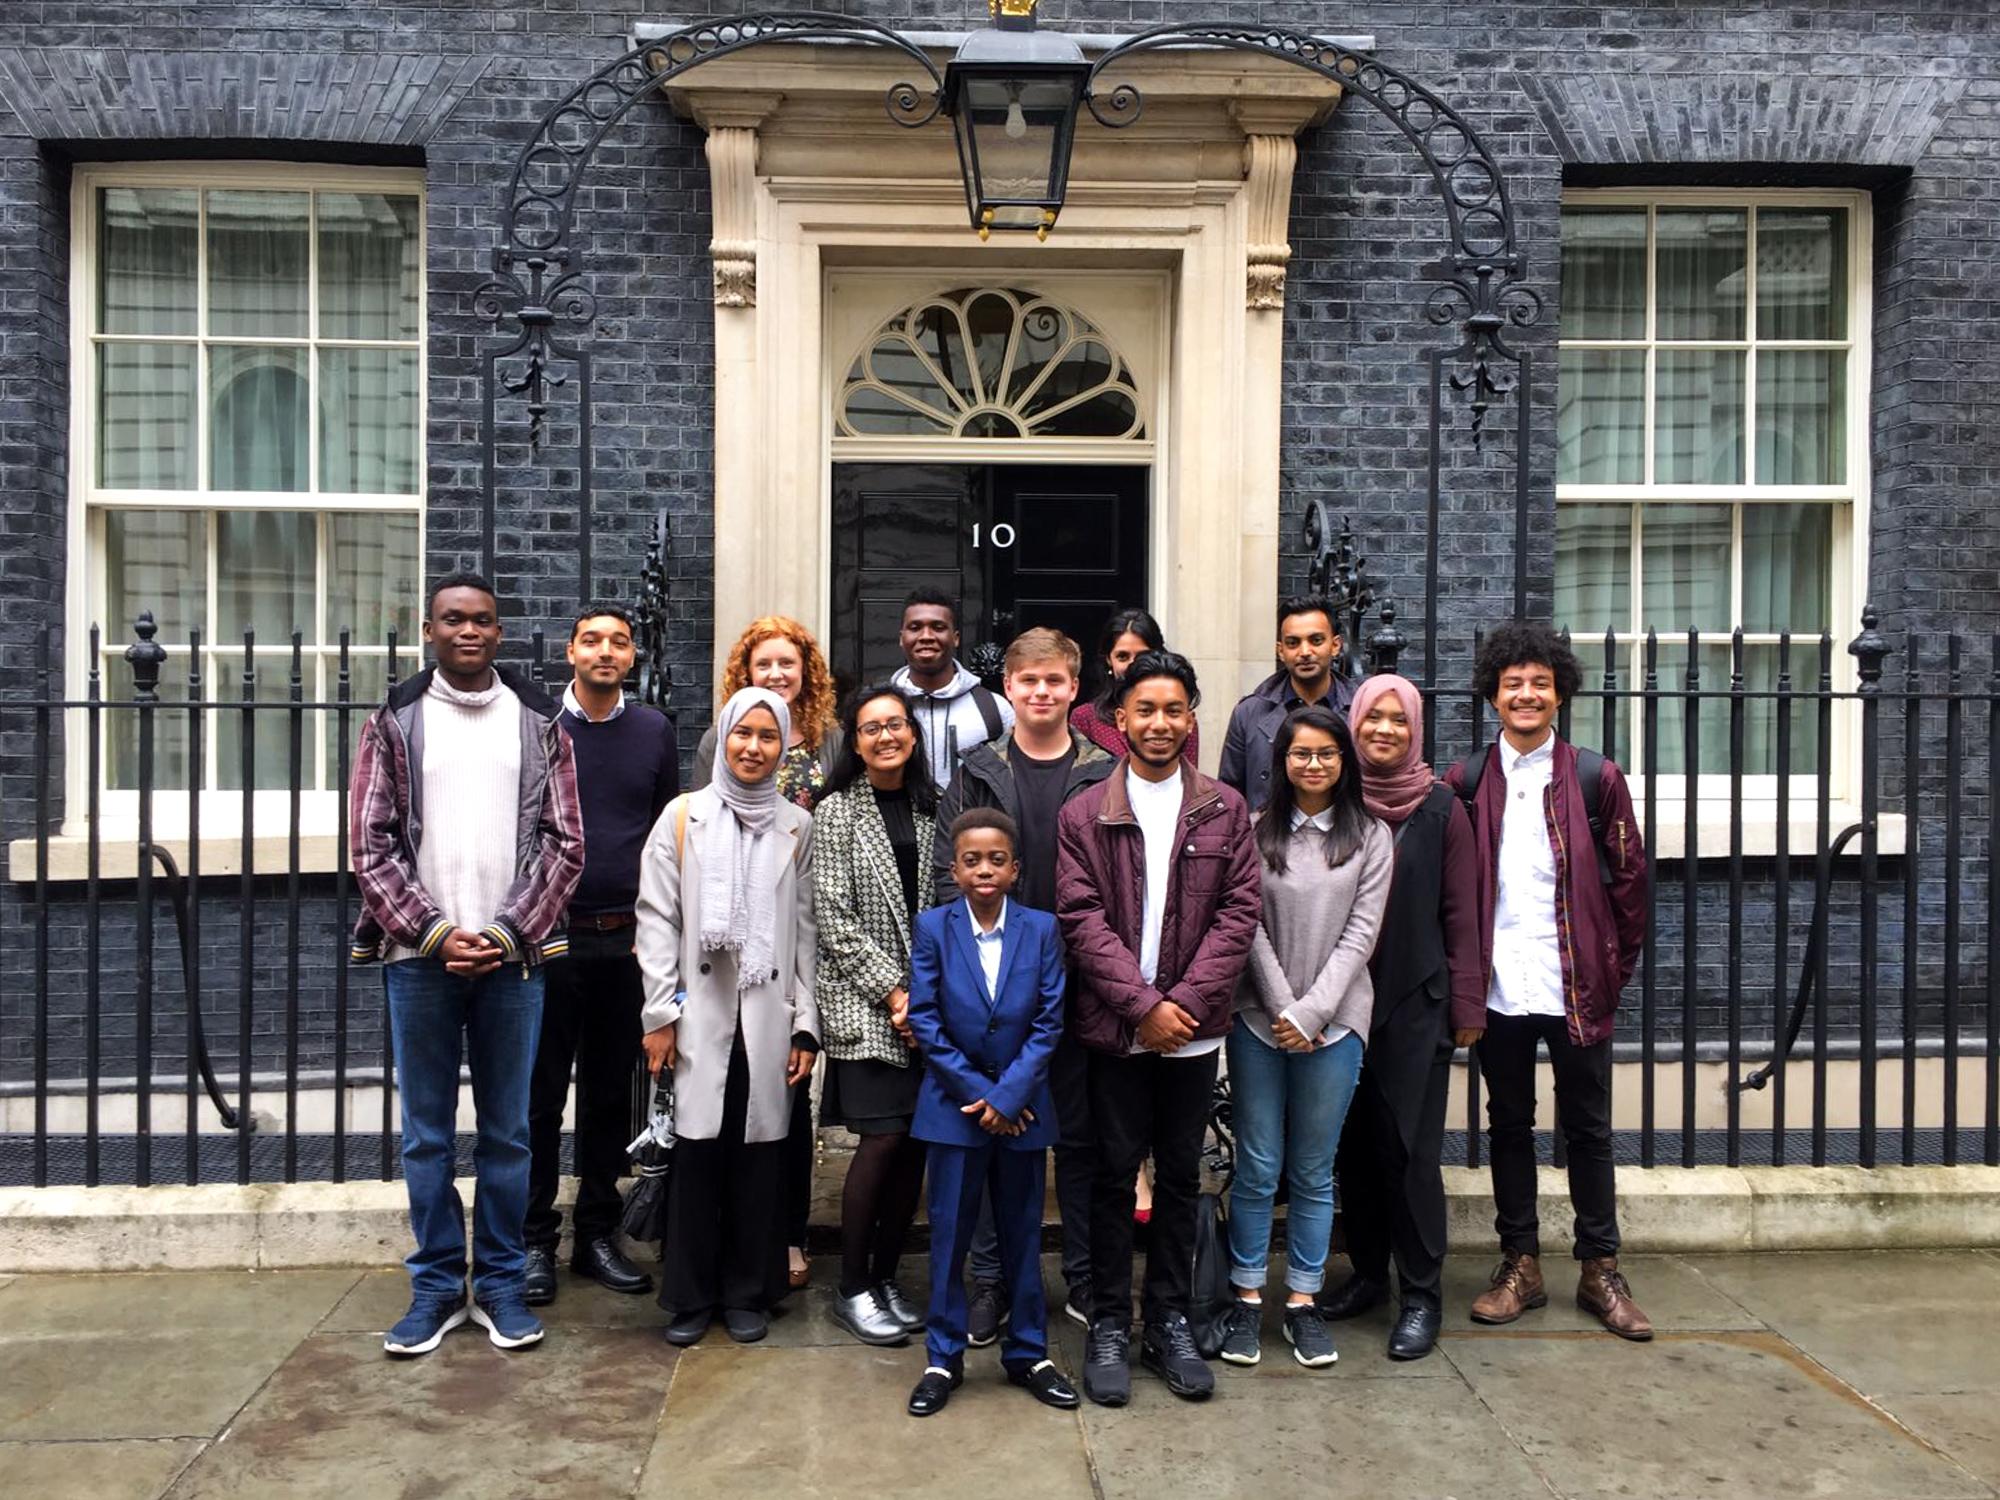 2017 Downing Street.jpg